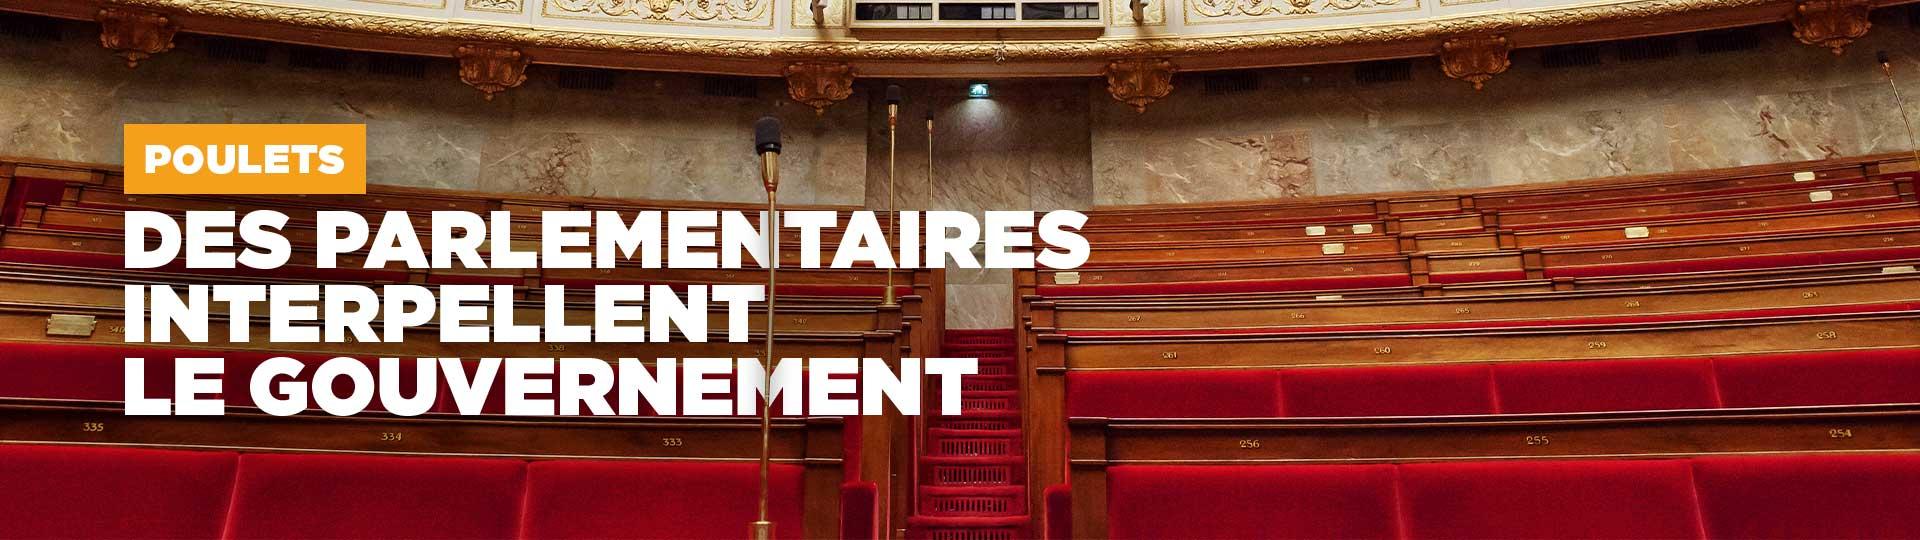 Questions parlementaires poulets